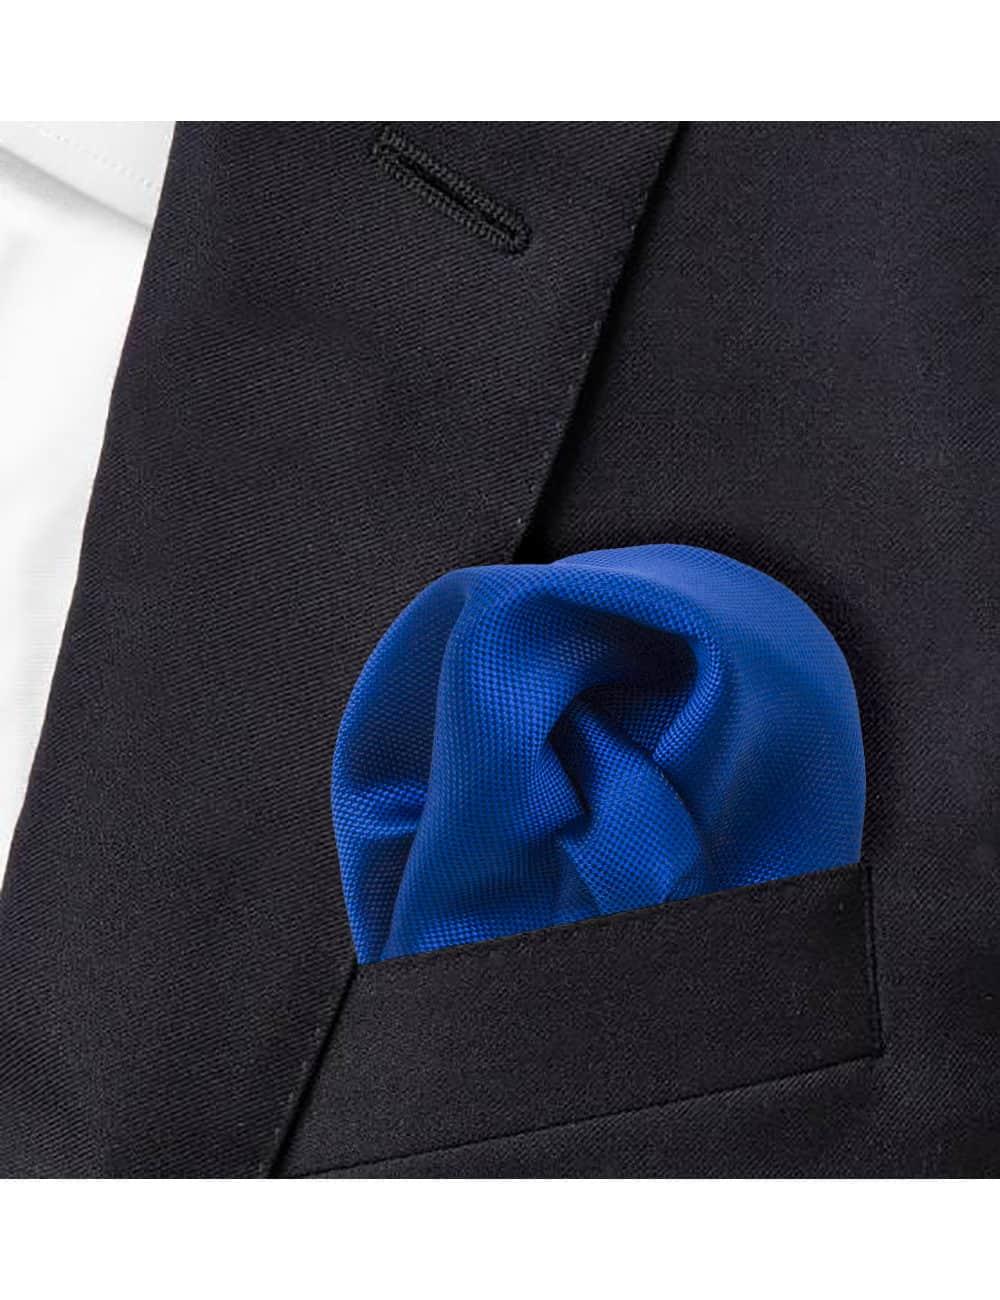 Blue Dobby Woven Pocket Square PSQ49.9